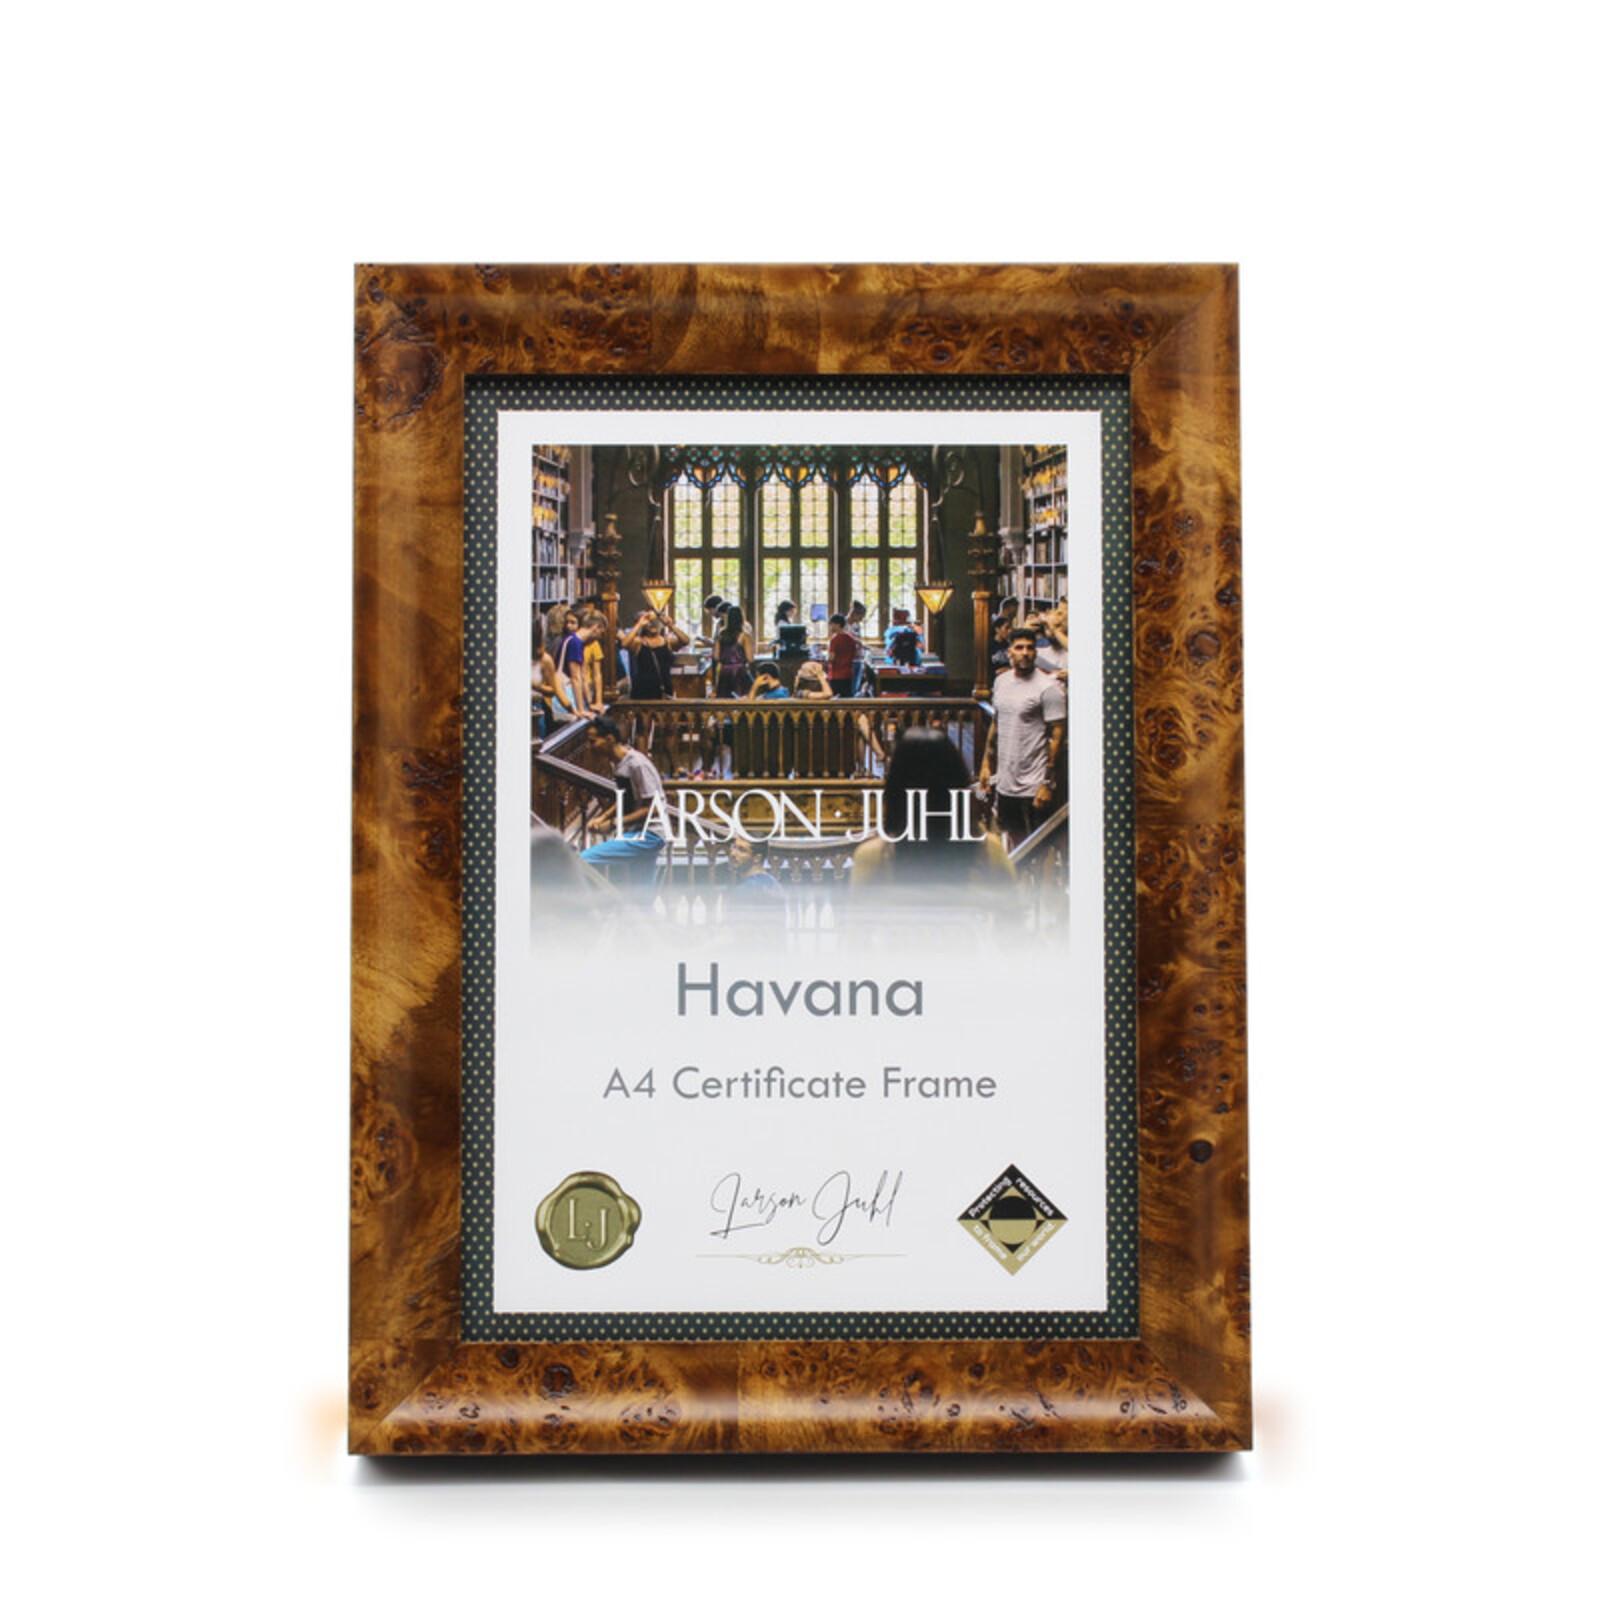 Havana A4 Toffee Certificate Frame